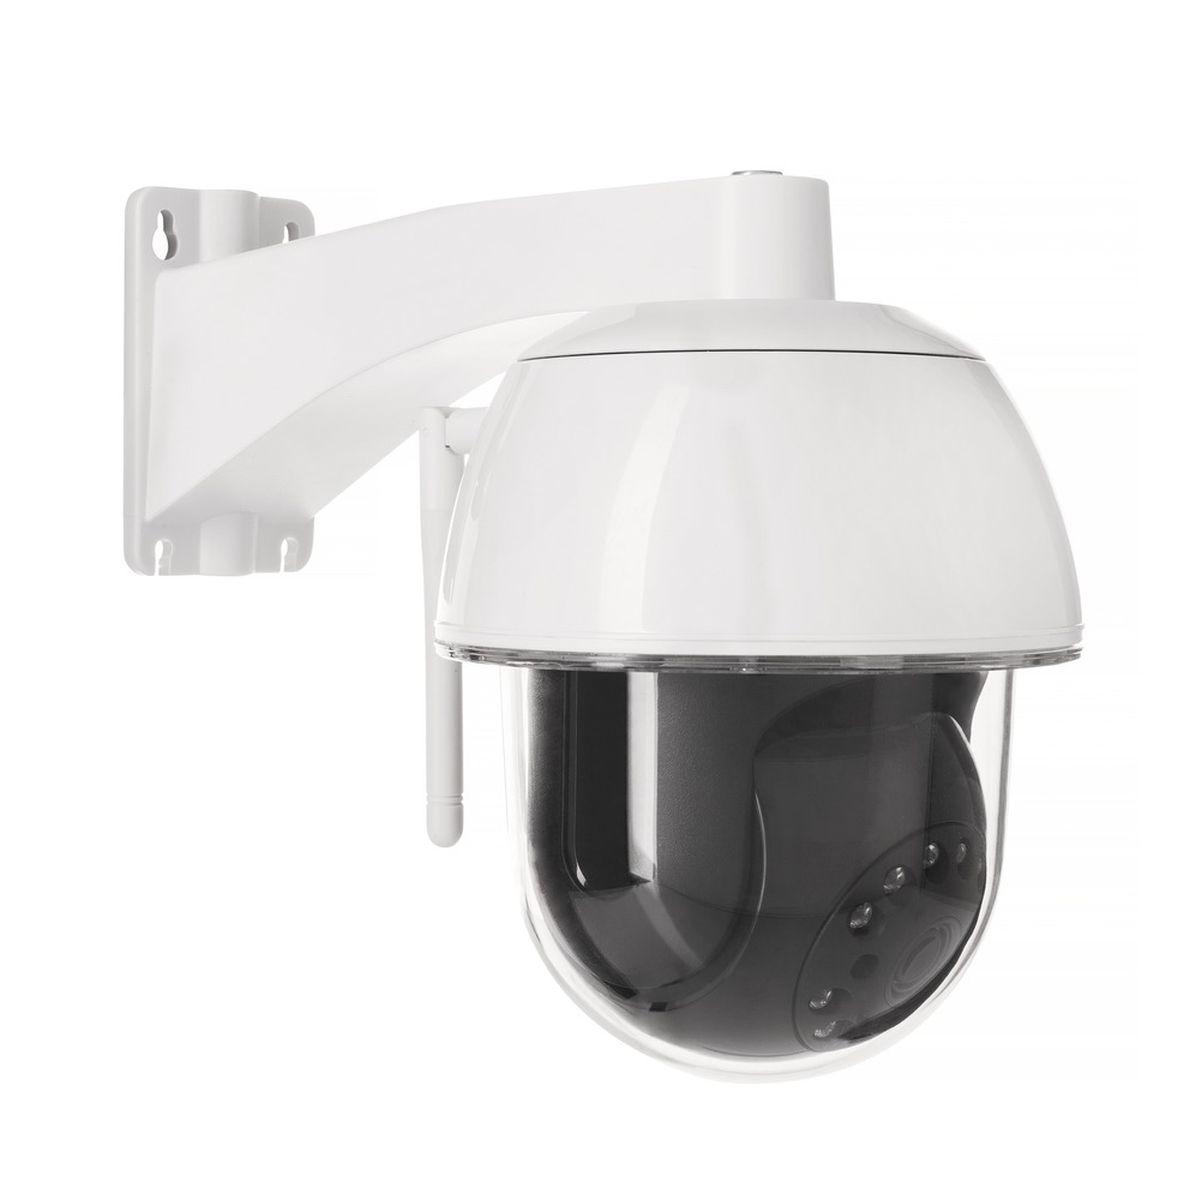 abus wlan schwenk neigeau enkamera berwachungskamera au enkamera ppic32520 neu ebay. Black Bedroom Furniture Sets. Home Design Ideas